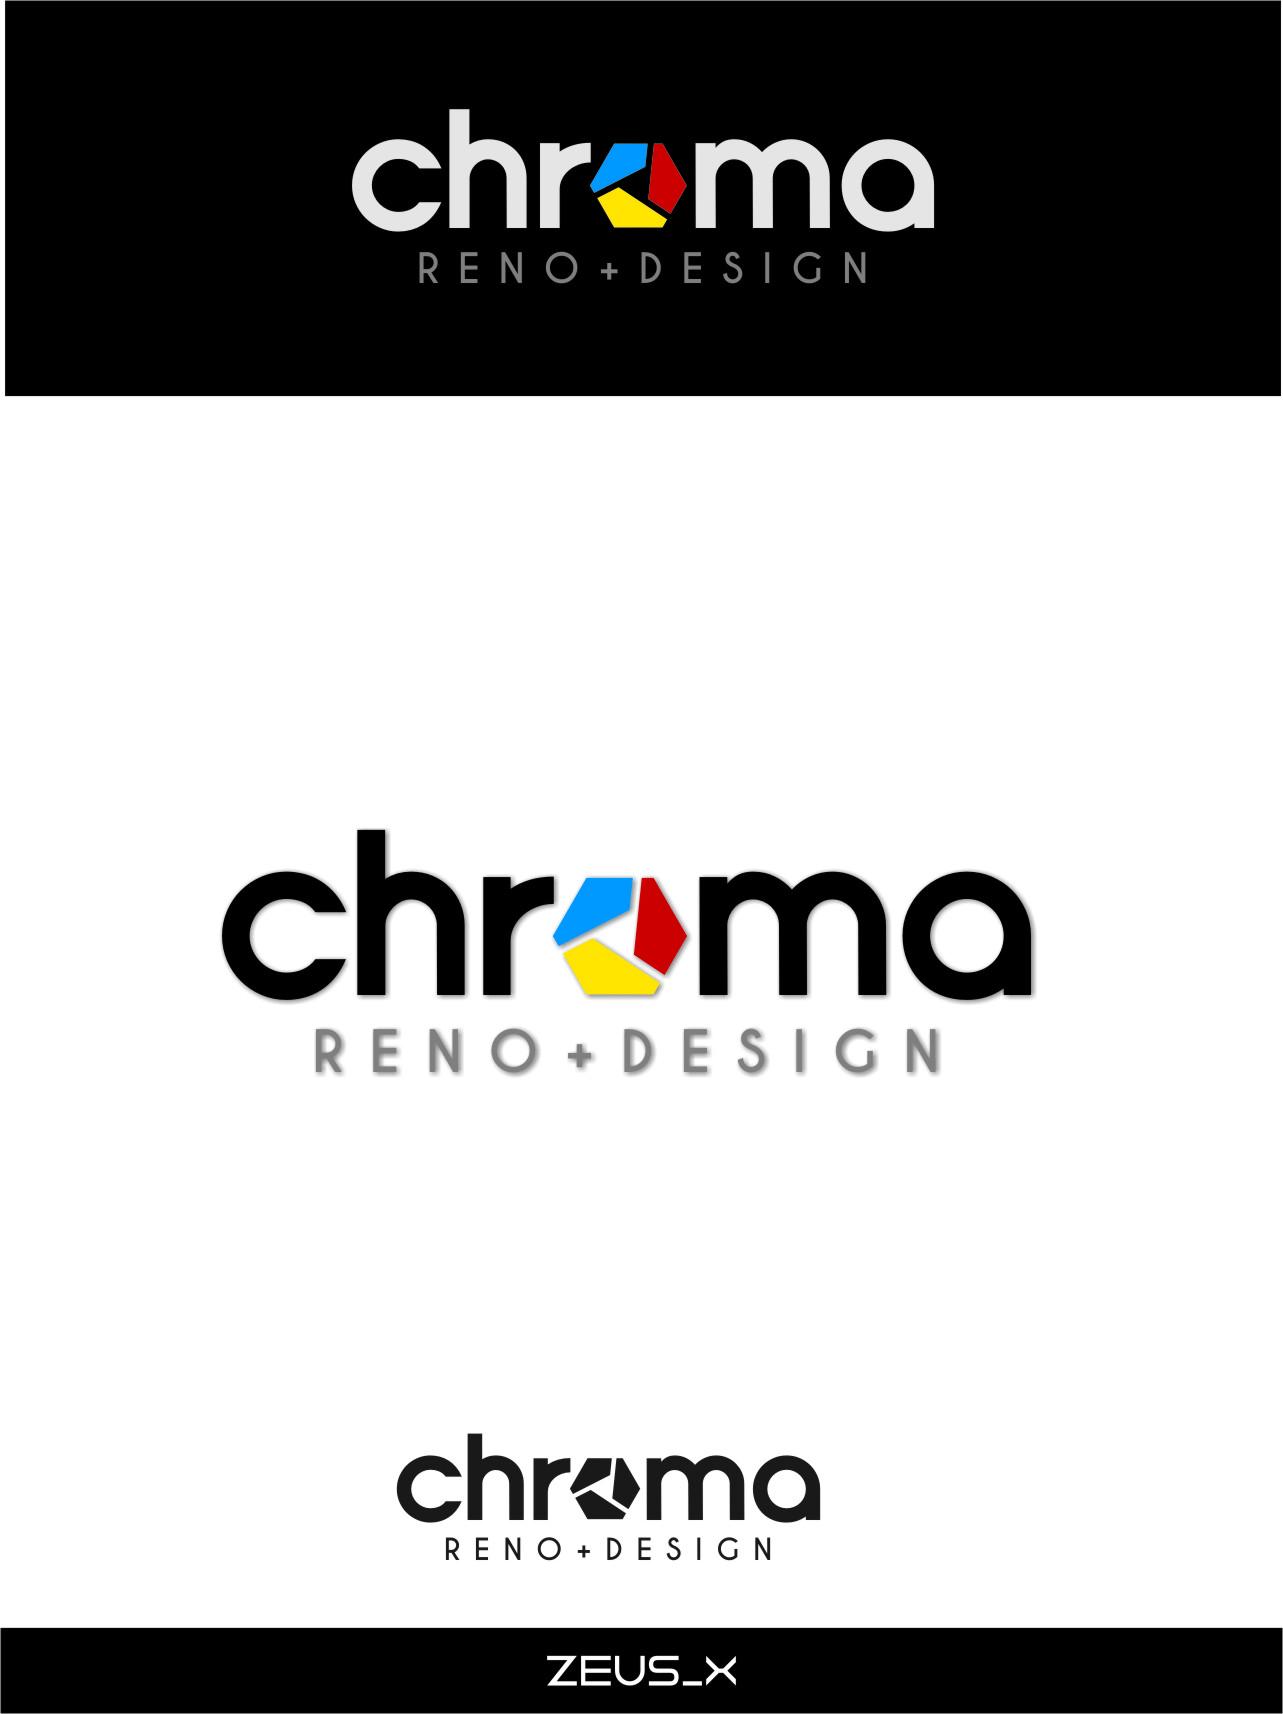 Logo Design by RoSyid Rono-Rene On Java - Entry No. 291 in the Logo Design Contest Inspiring Logo Design for Chroma Reno+Design.